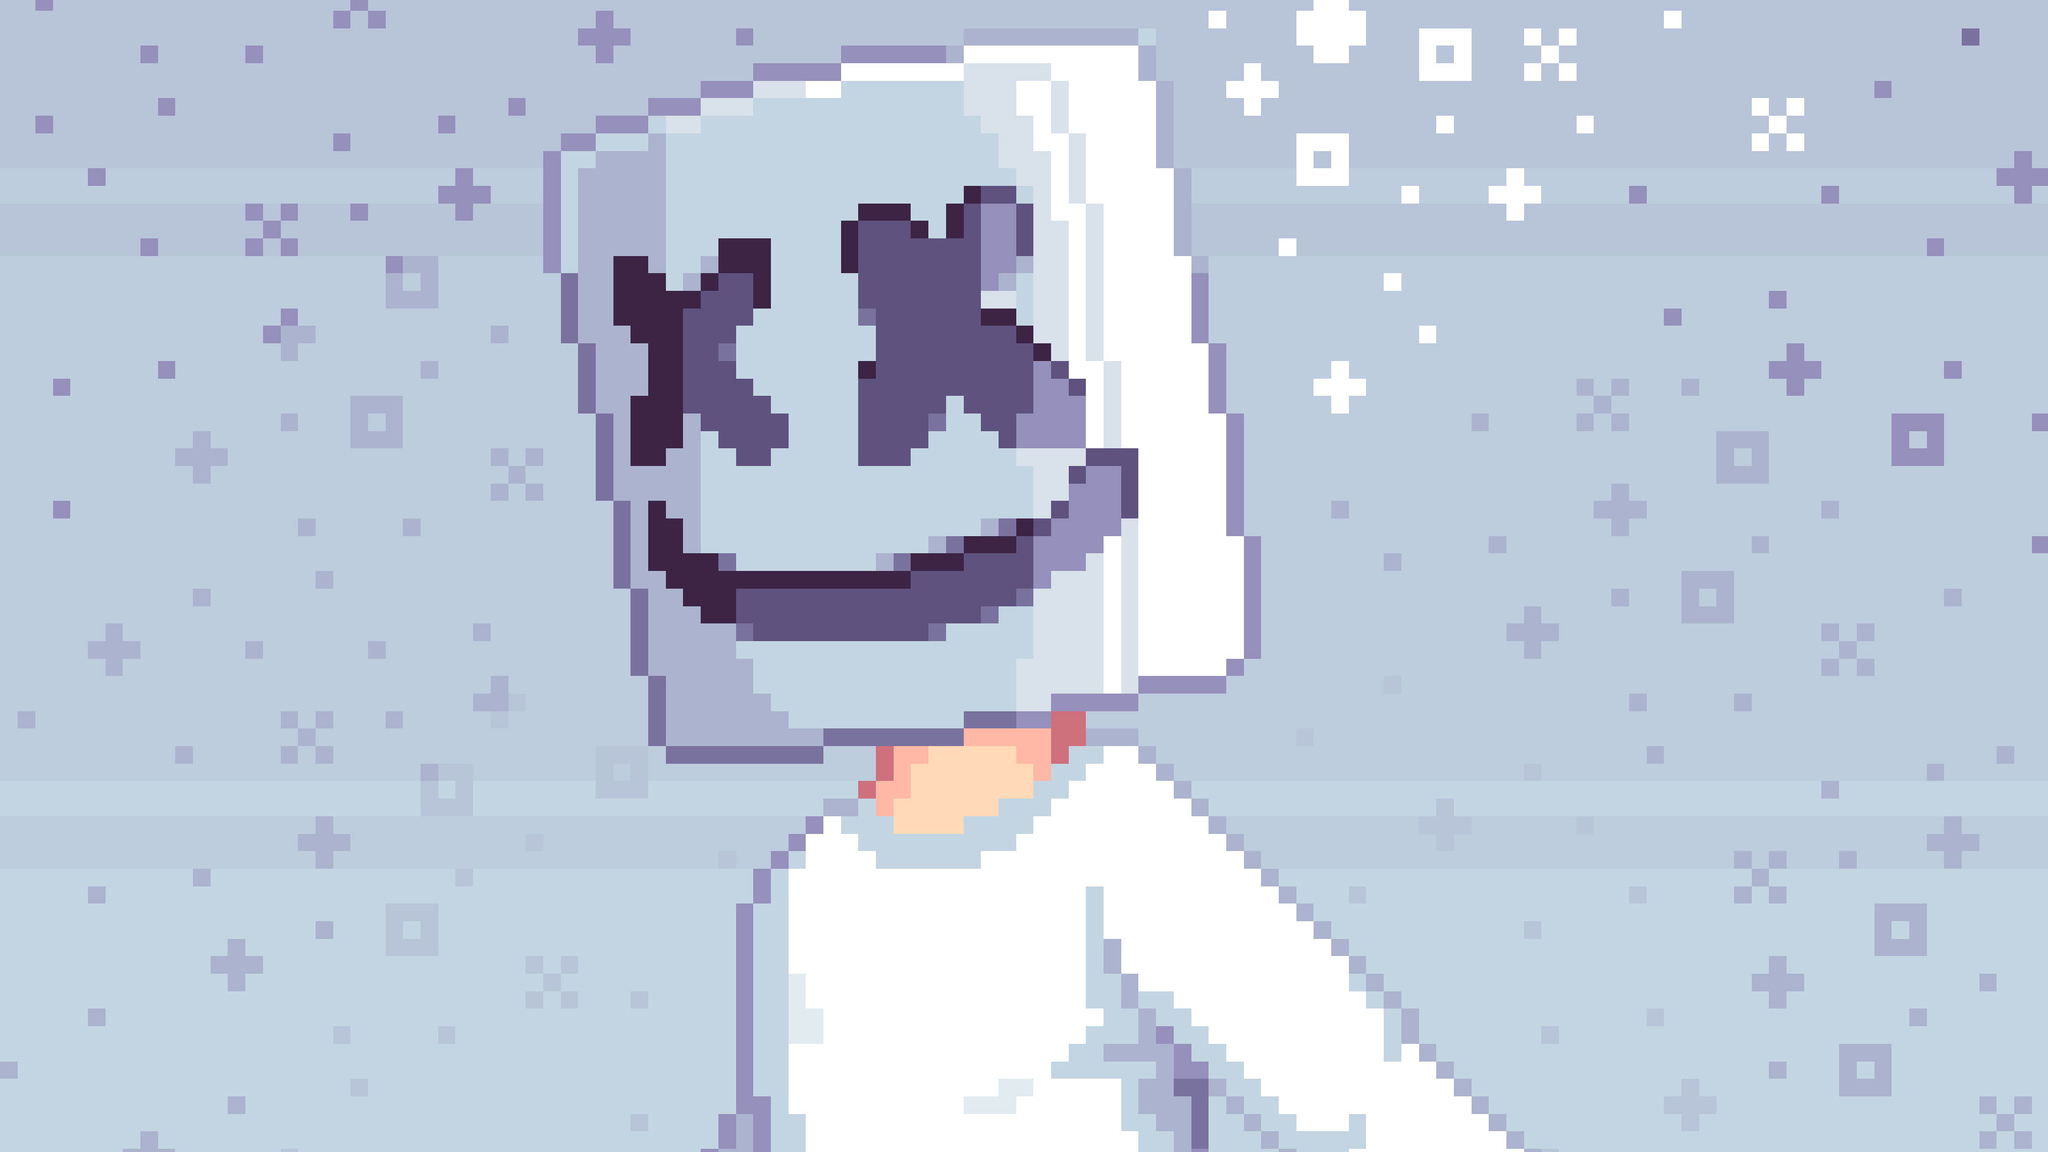 2048x1152 Pixel Marshmello Art 2048x1152 Resolution Hd 4k